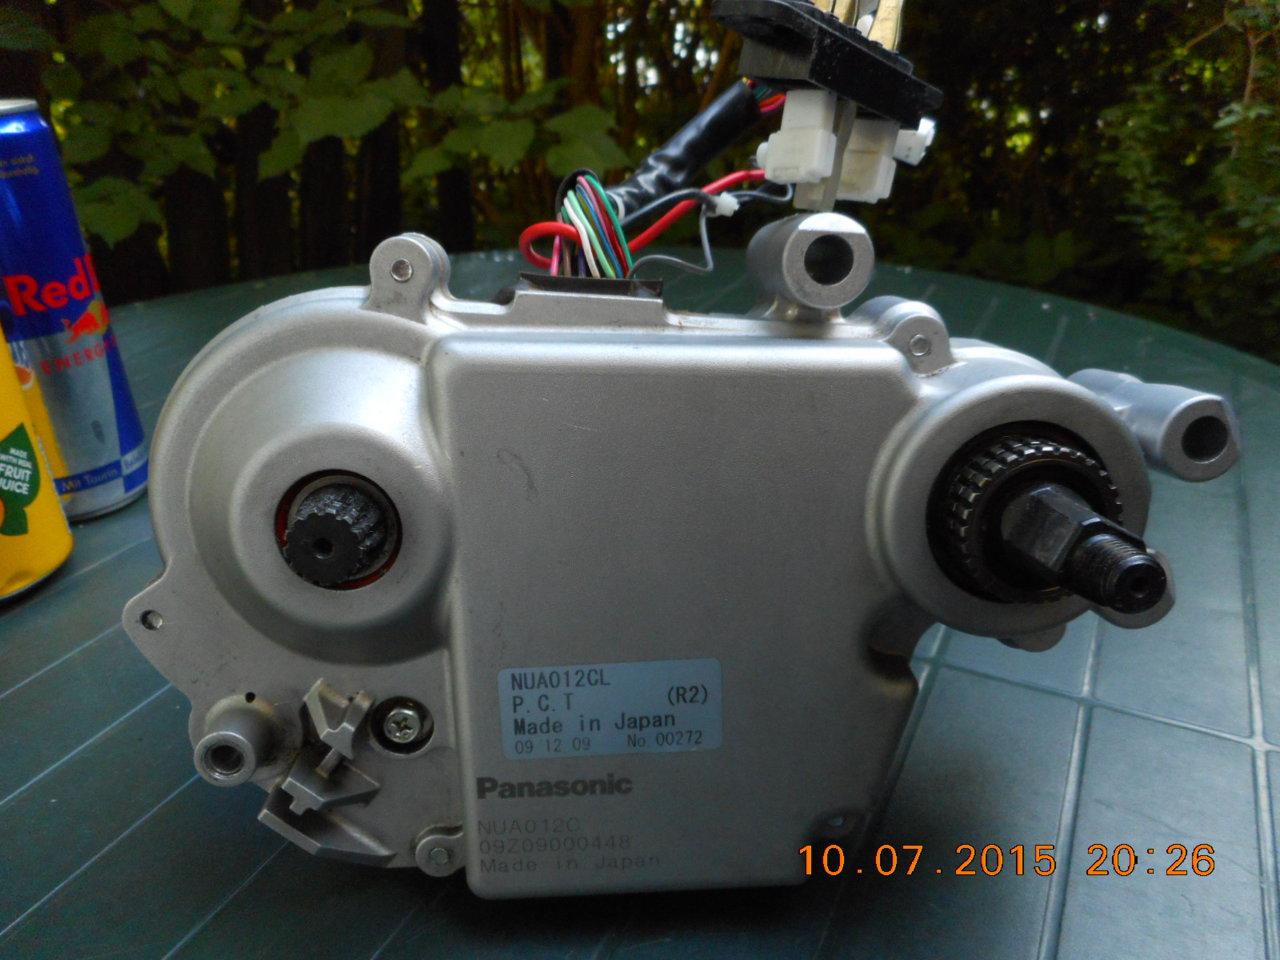 Erledigt Panasonic Motor F R E Bike Pedelec 26v 250